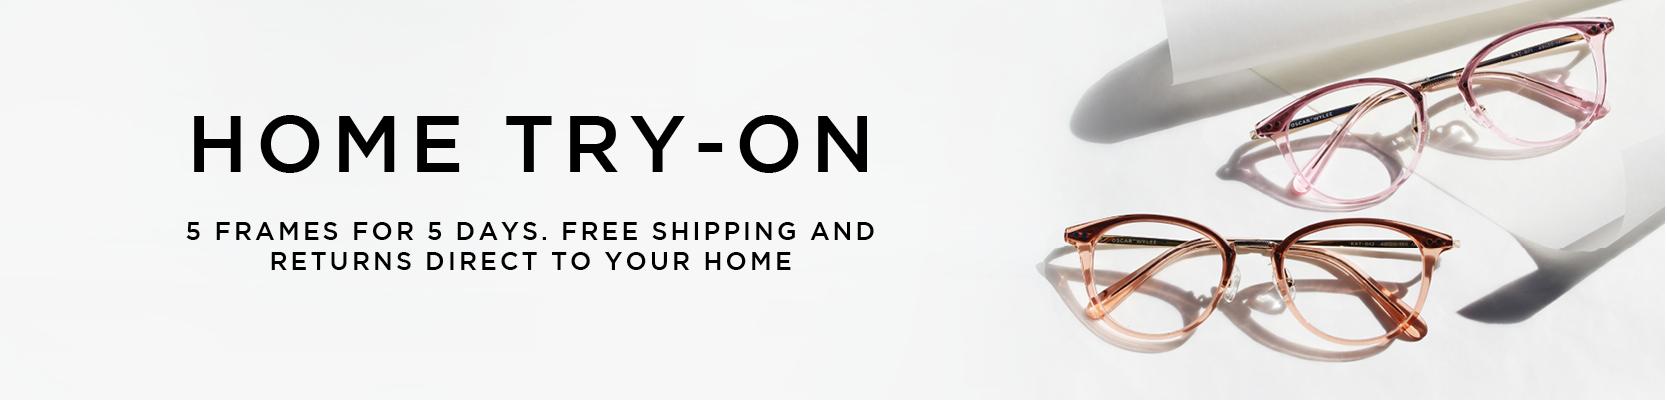 Home Try-on • Oscar Wylee 50eee1acfc4e